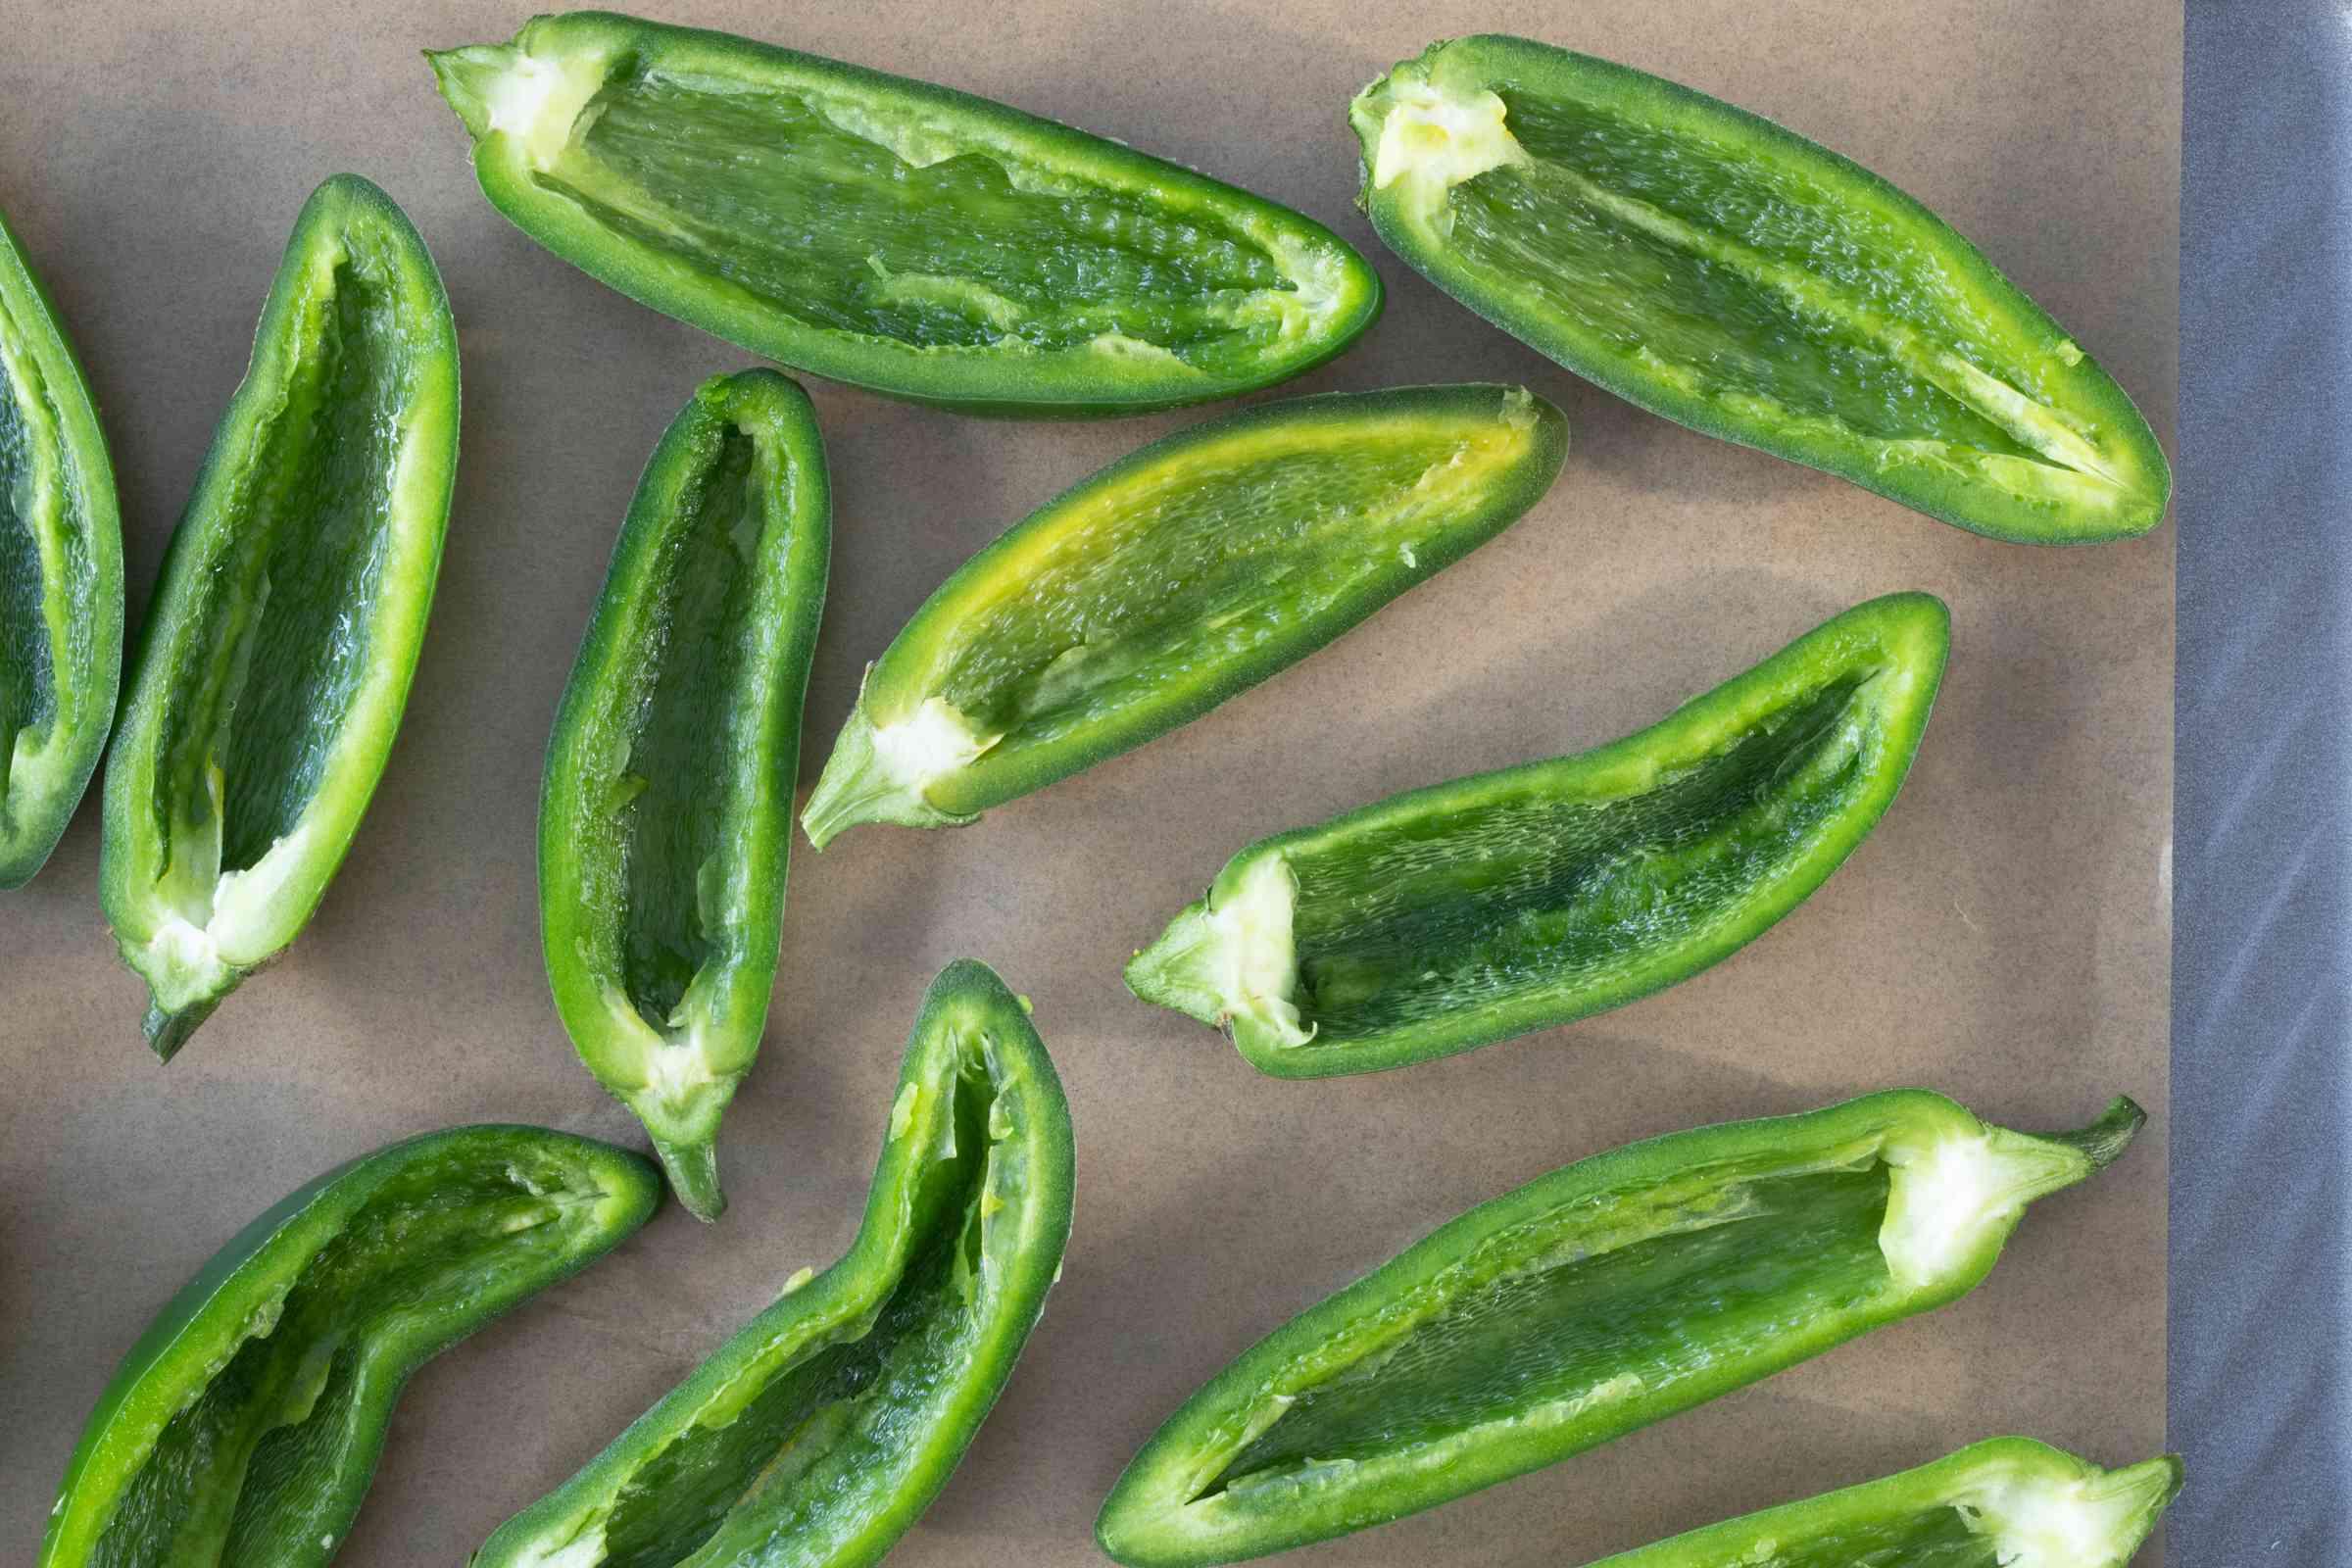 jalapeno pepper halves, seeds removed